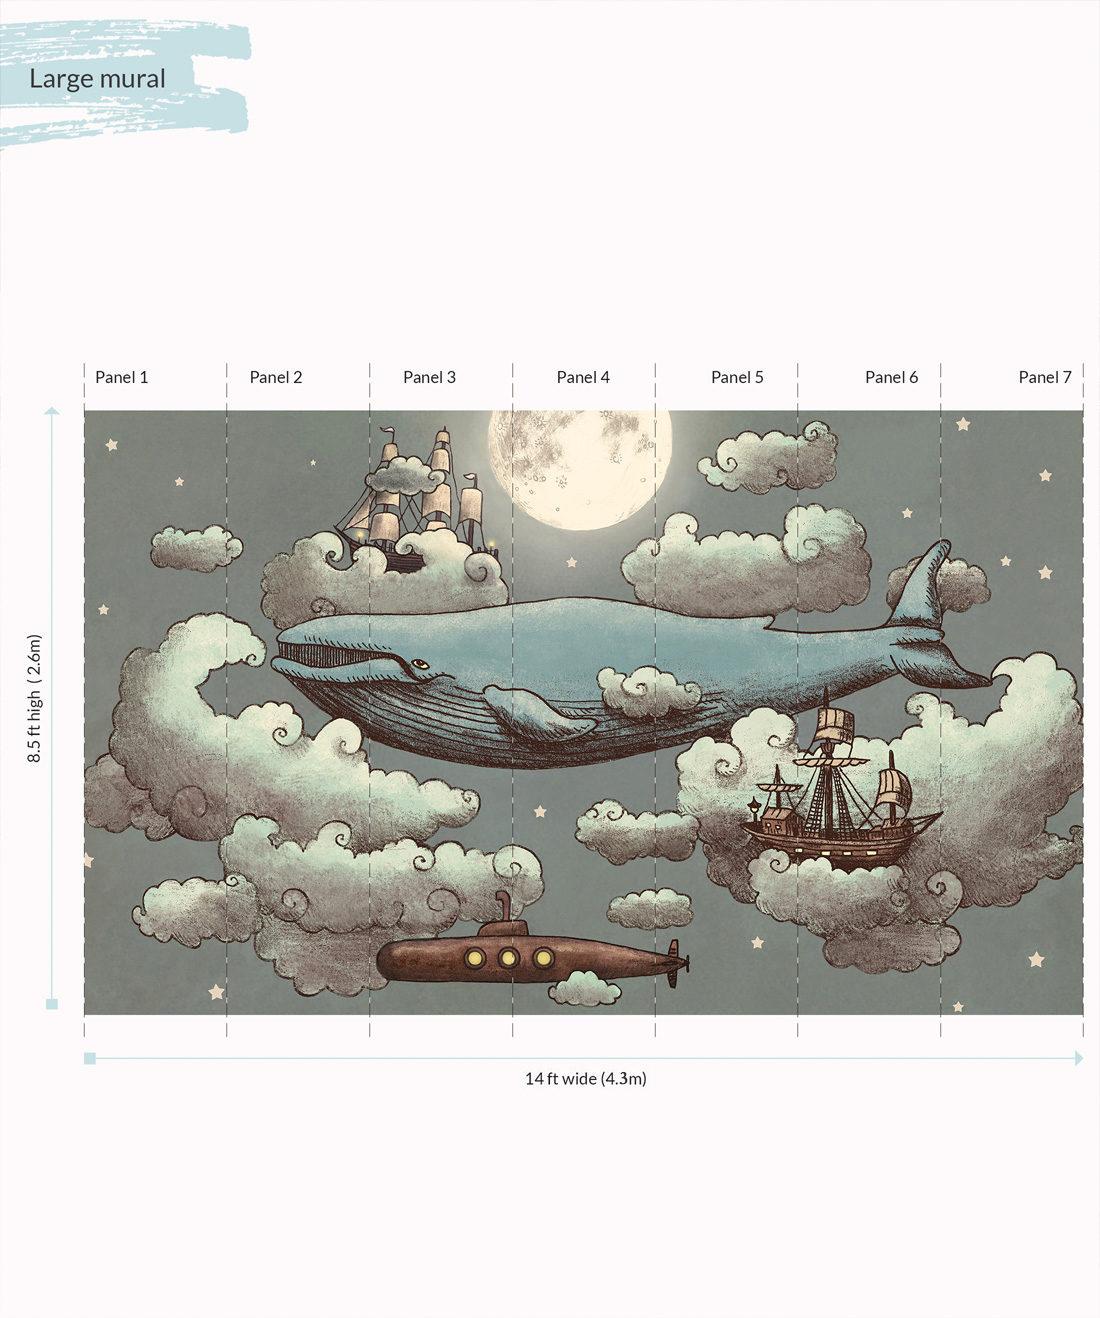 Ocean Meets the Sky Wall Mural - Large